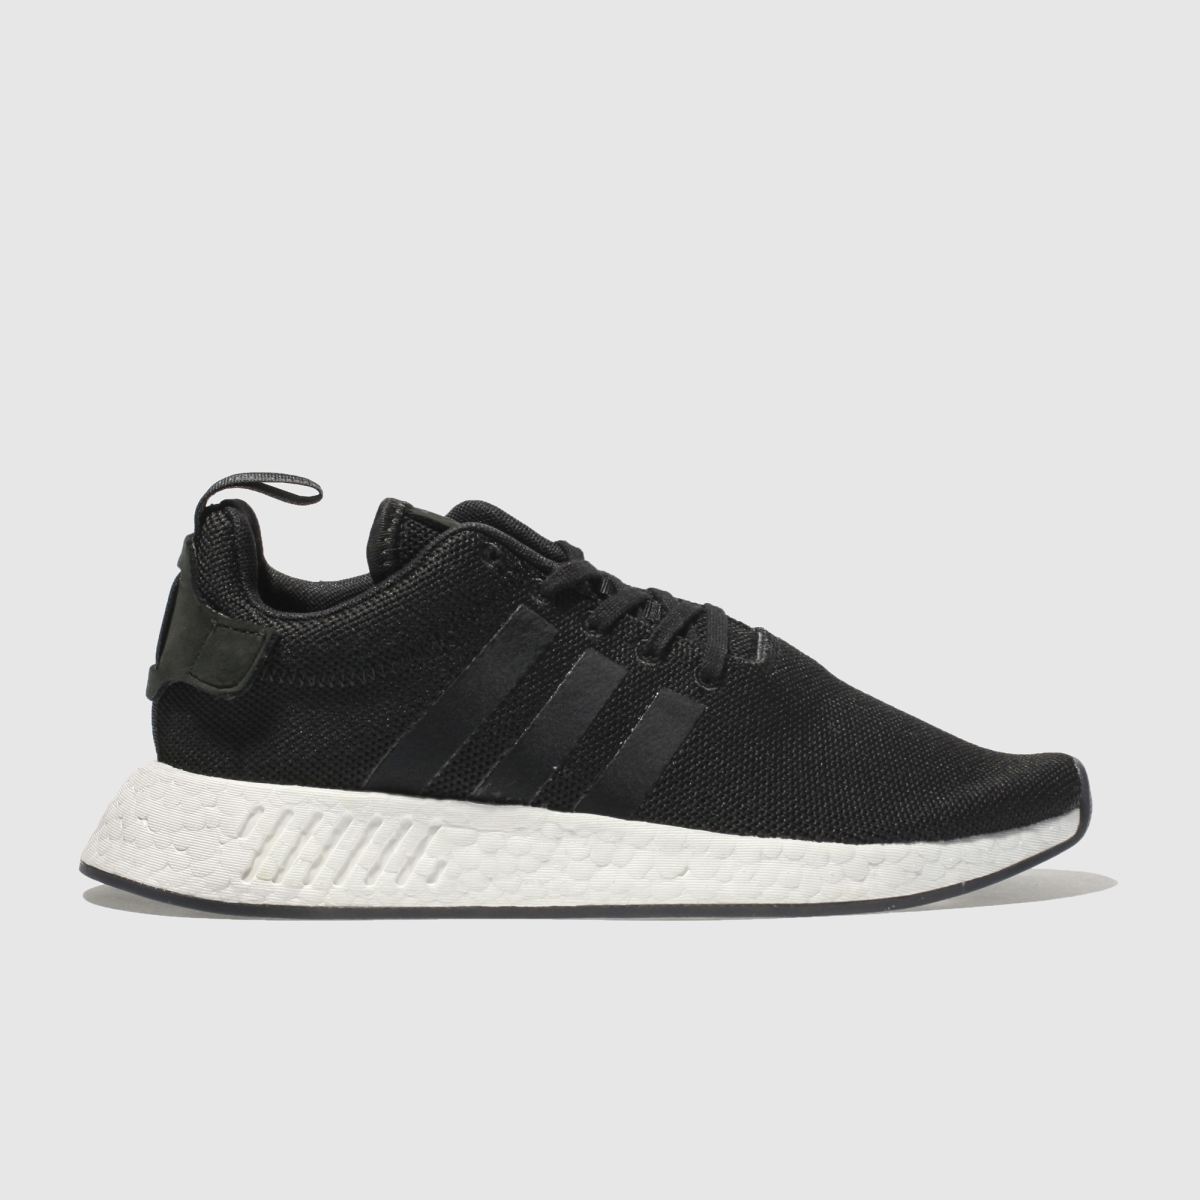 Adidas Black & White Nmd R2 Trainers